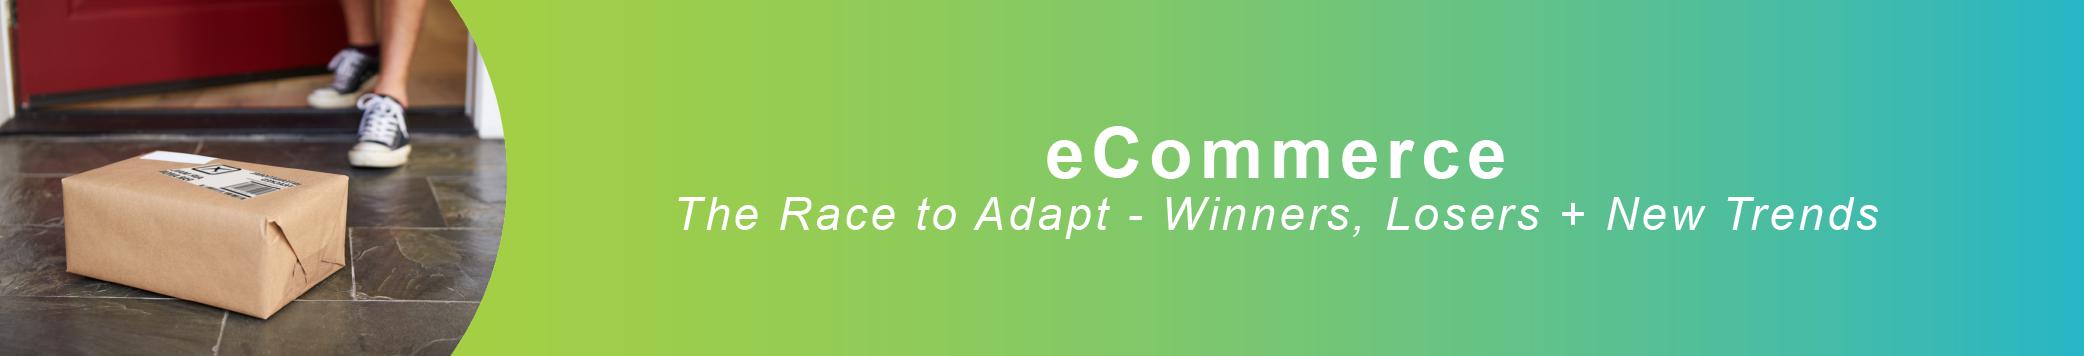 ecommerce header-01